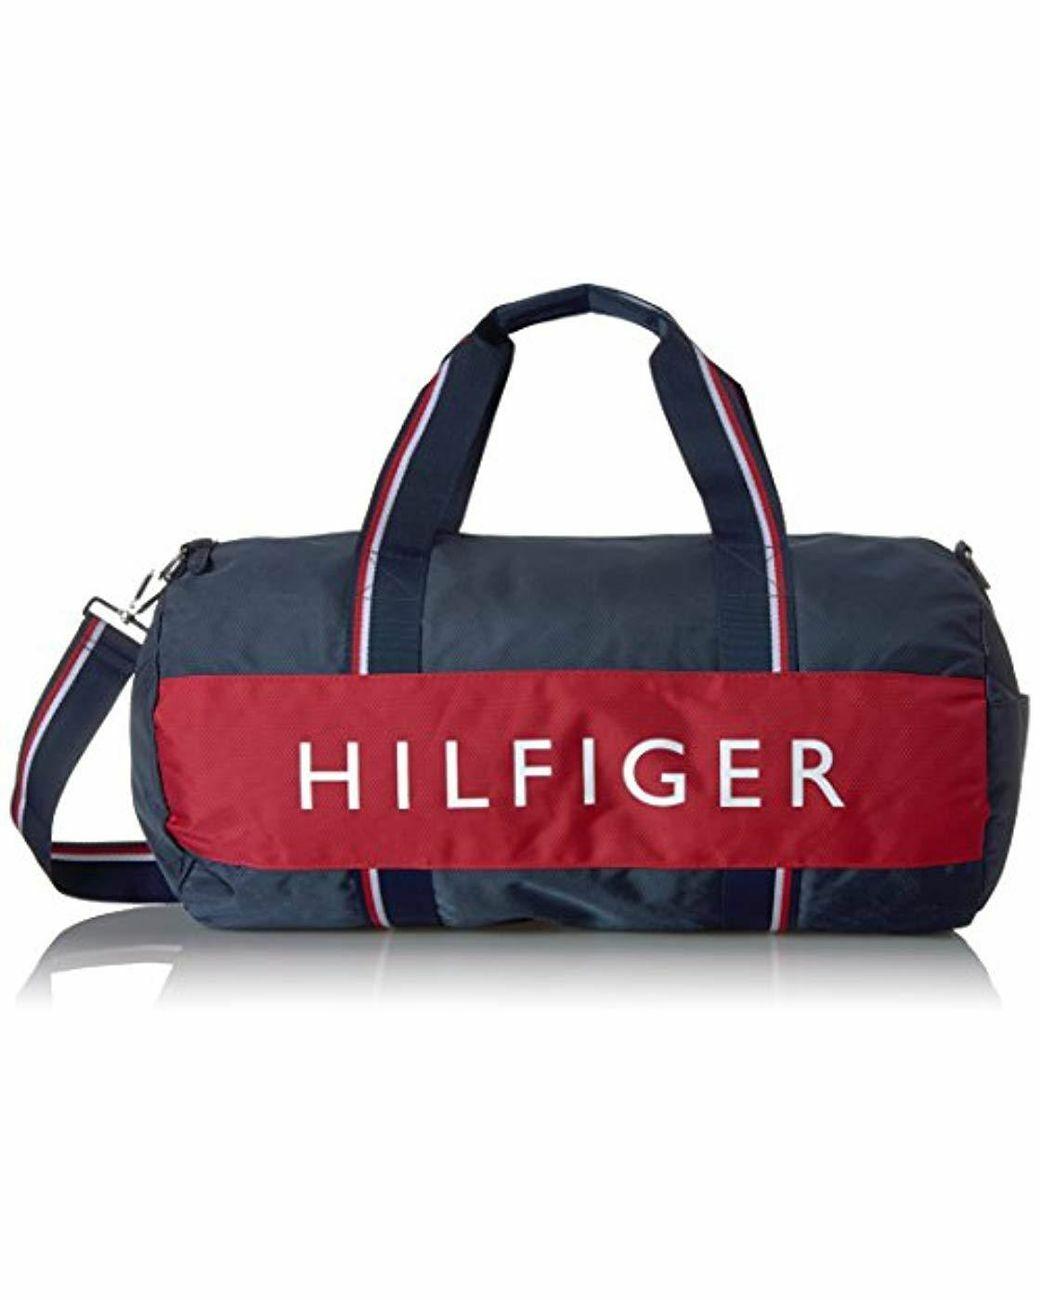 Tommy Hilfiger Large GYM Bag Duffle Bag UNISEX New w Tags